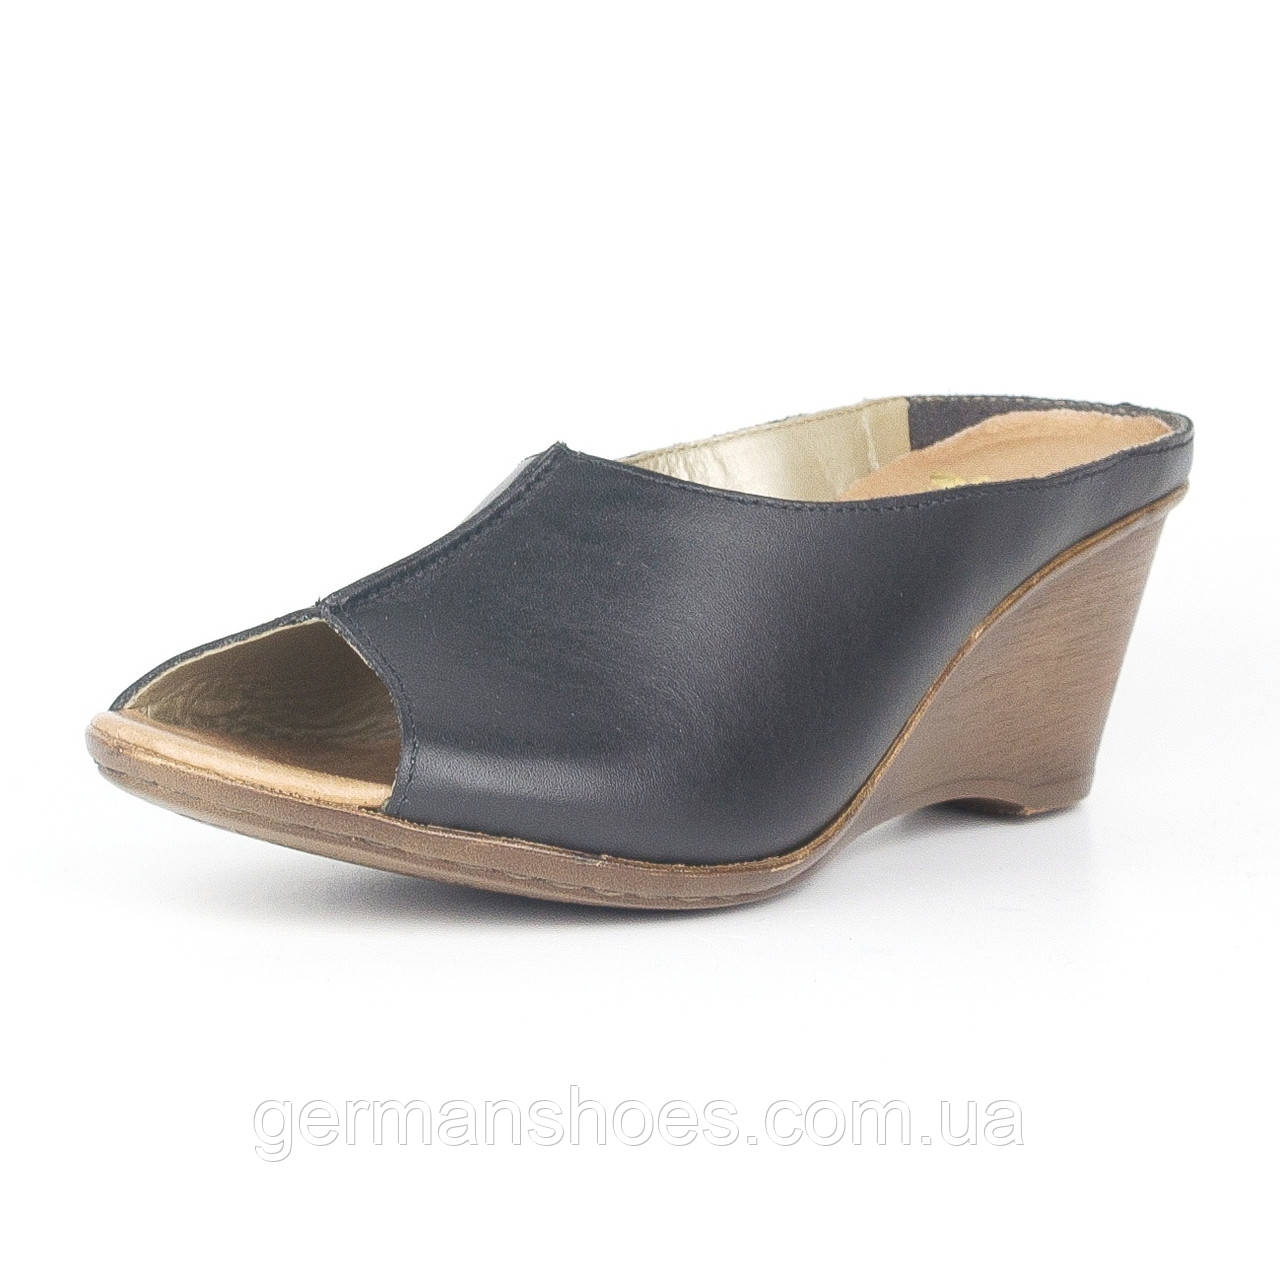 e4692d8a6 Сабо женские Rieker V1179-00 - Интернет-магазин обуви